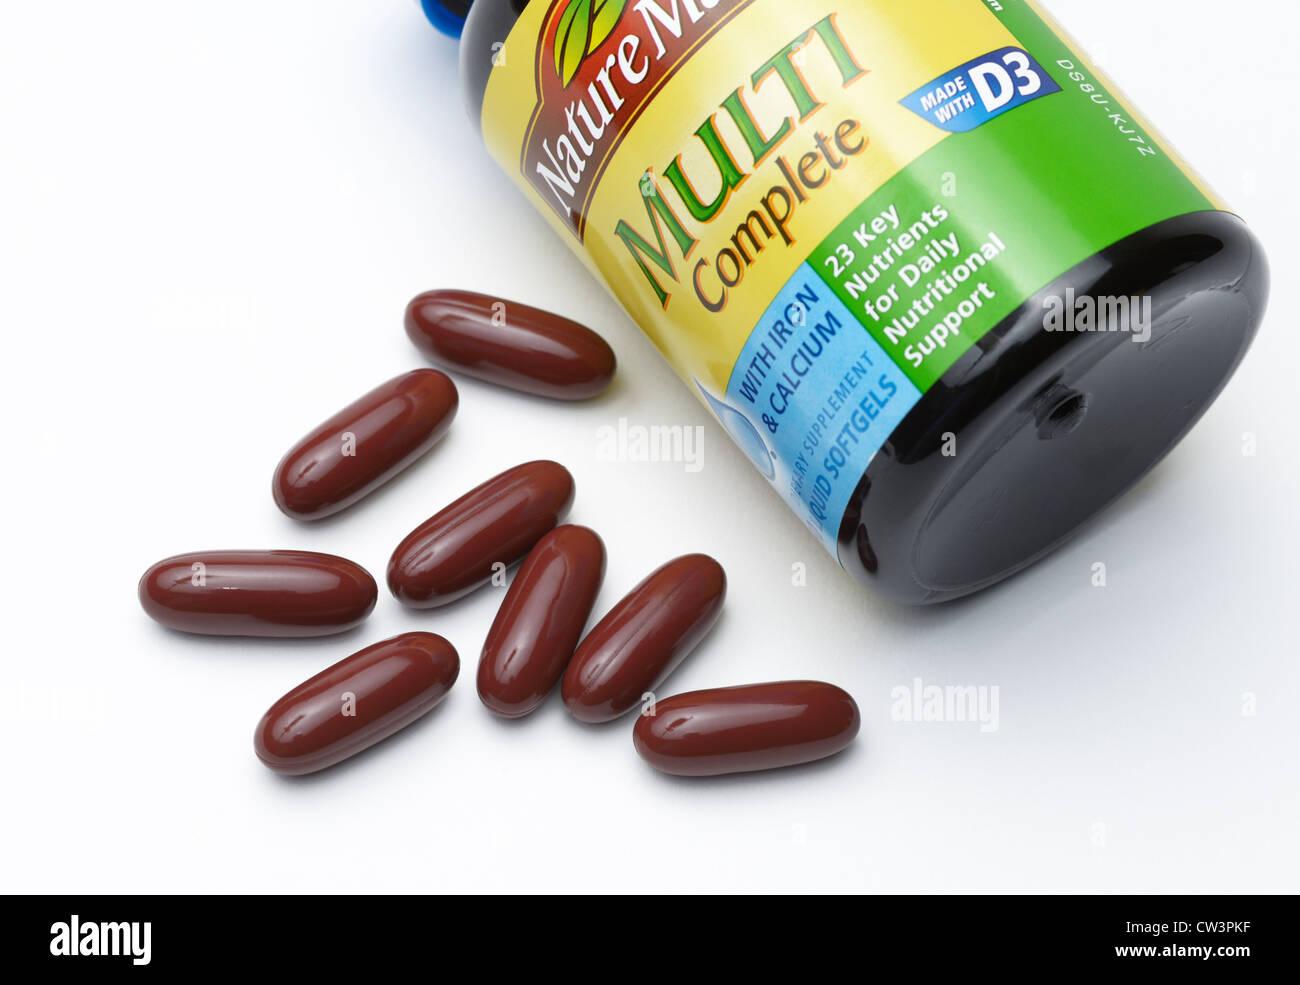 Multi vitamin supplements - Stock Image